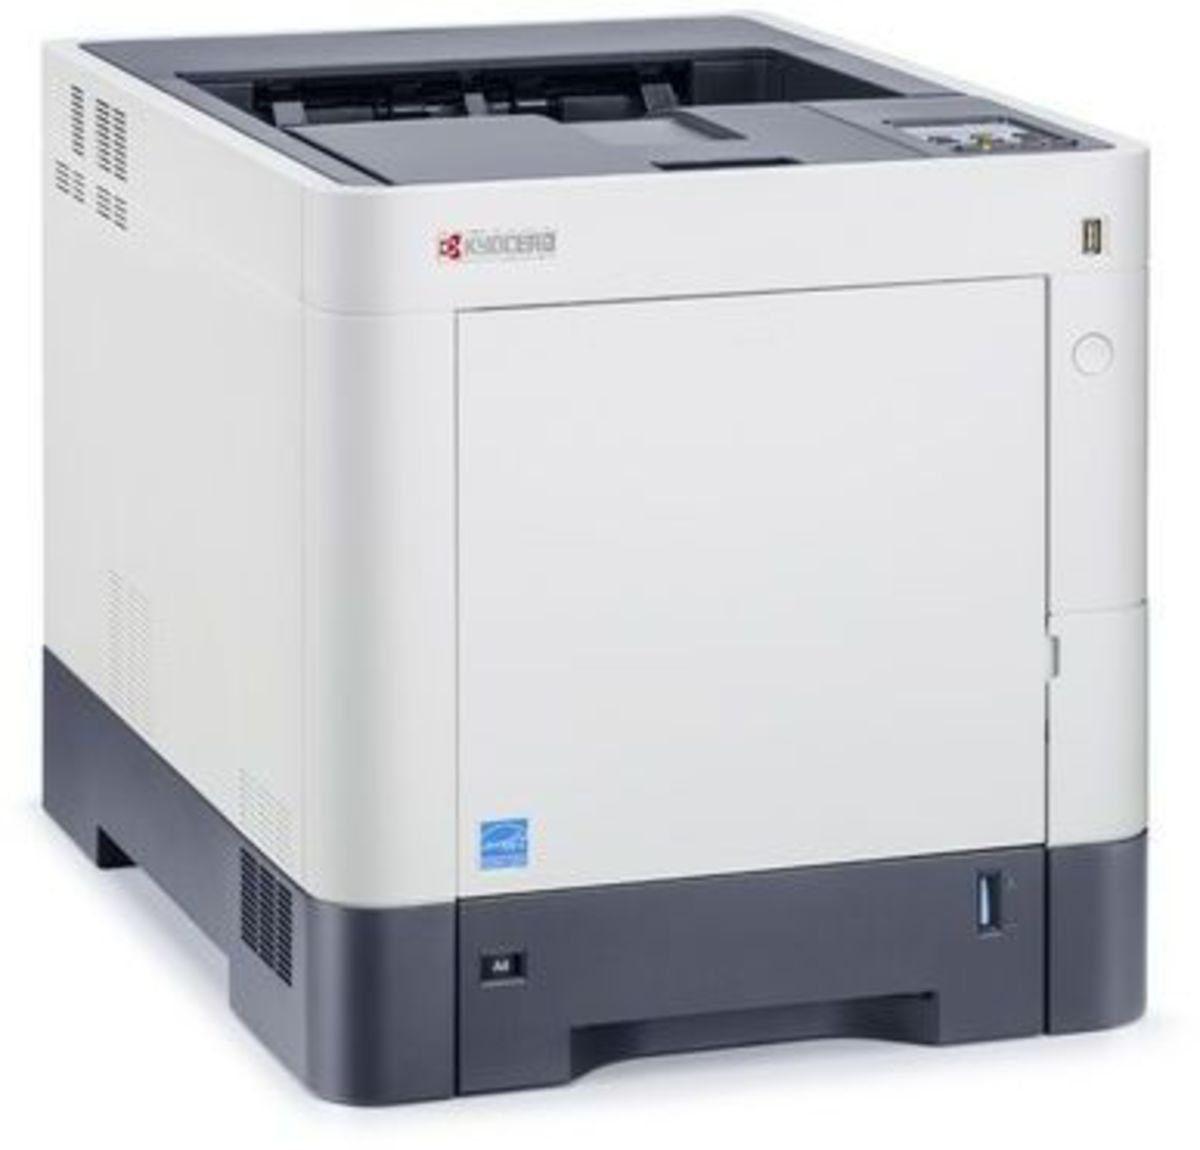 Kyocera Farblaser-Drucker »ECOSYS P6130CDN Farblaserdrucker«